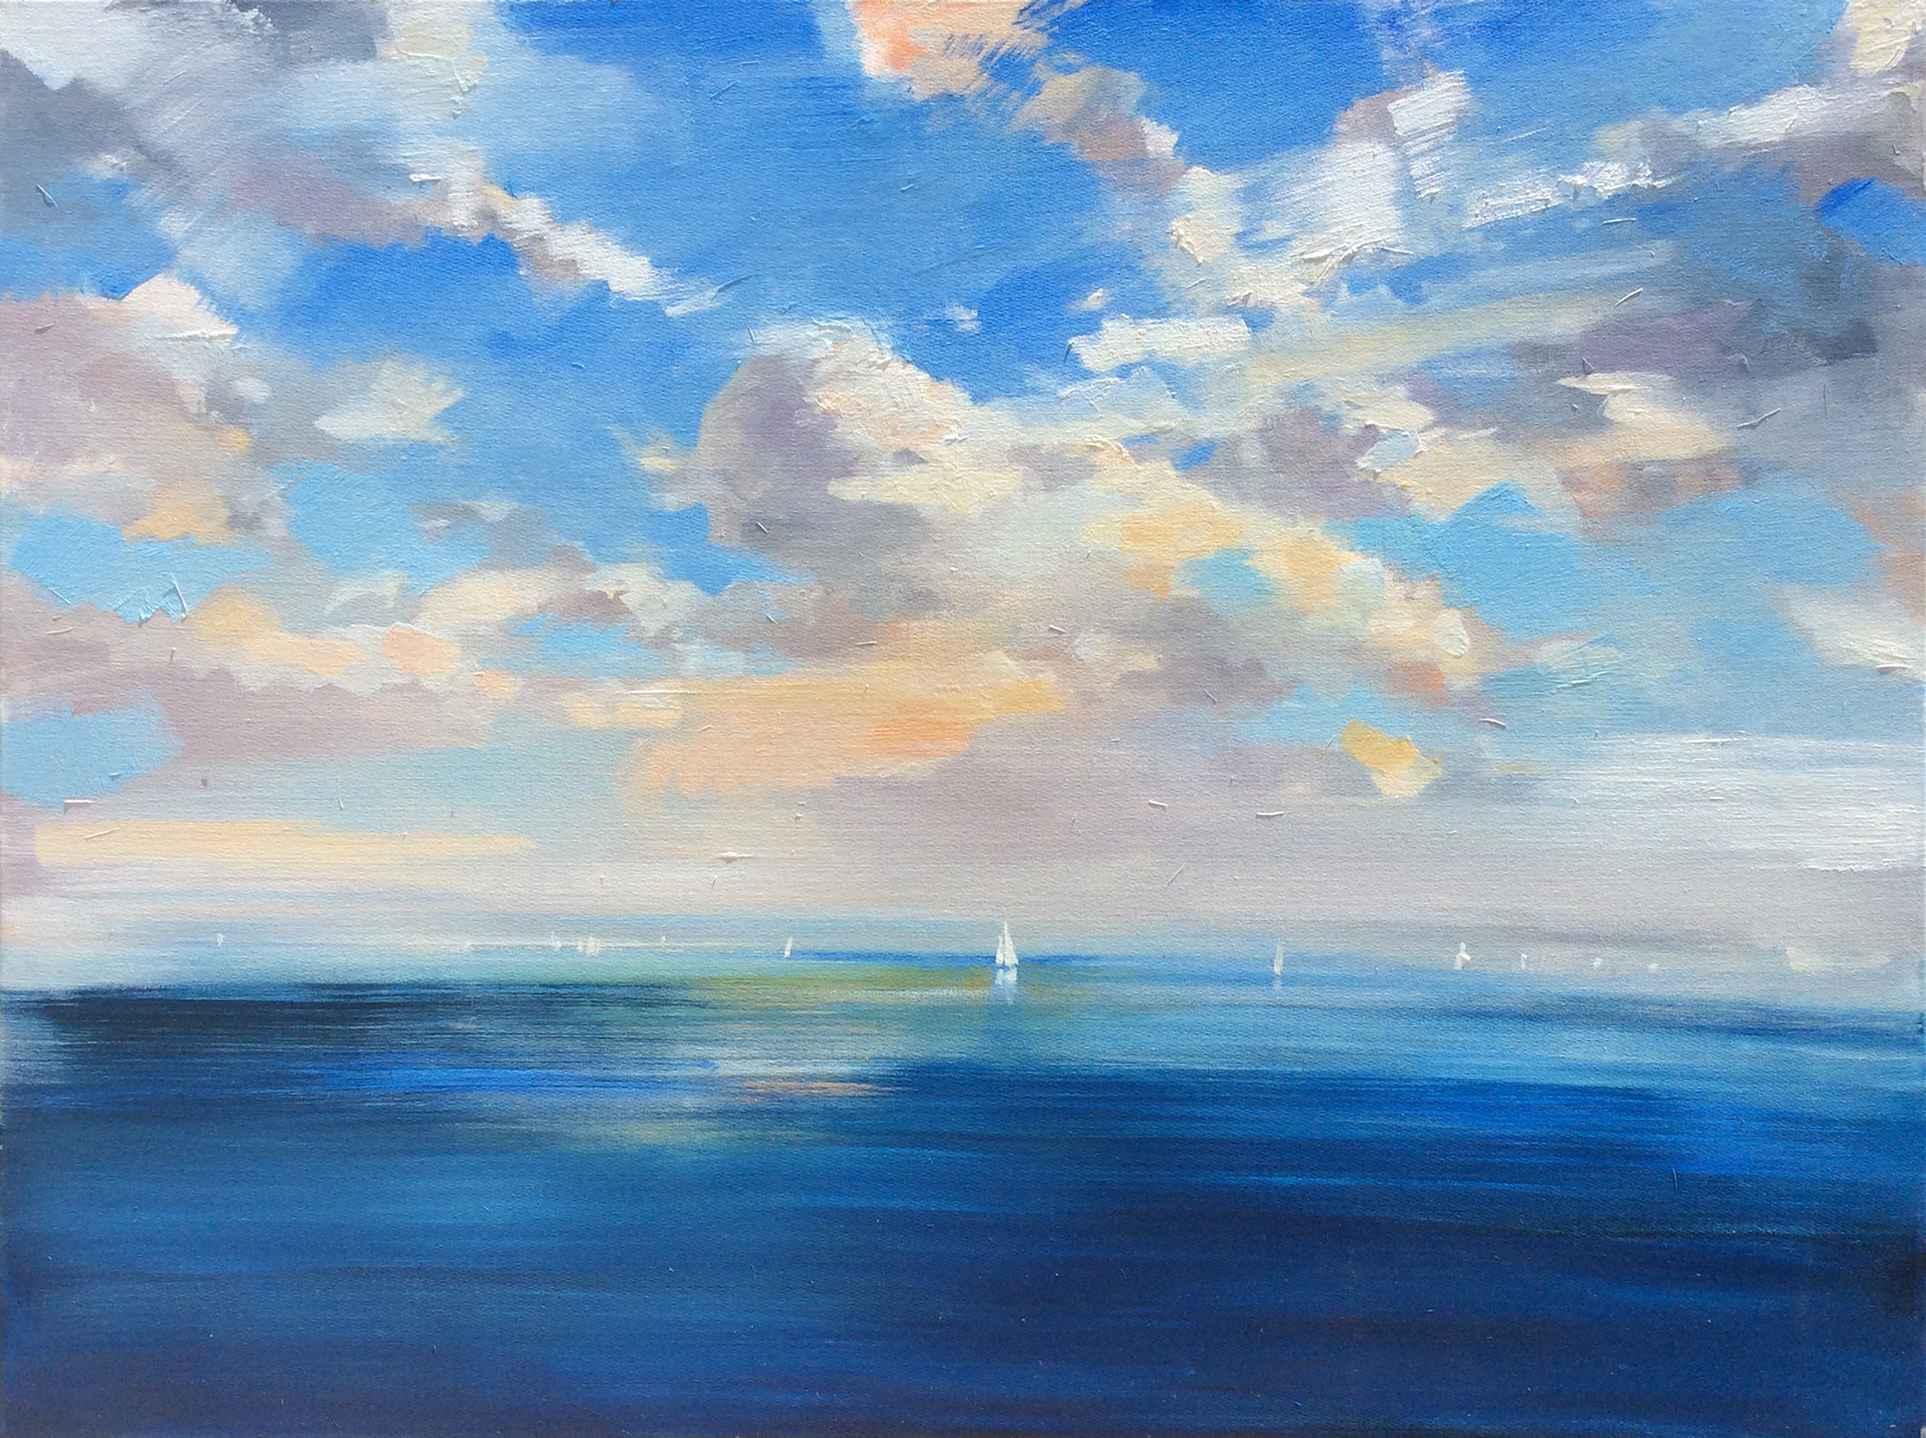 Sea Breeze by  Craig Mooney - Masterpiece Online